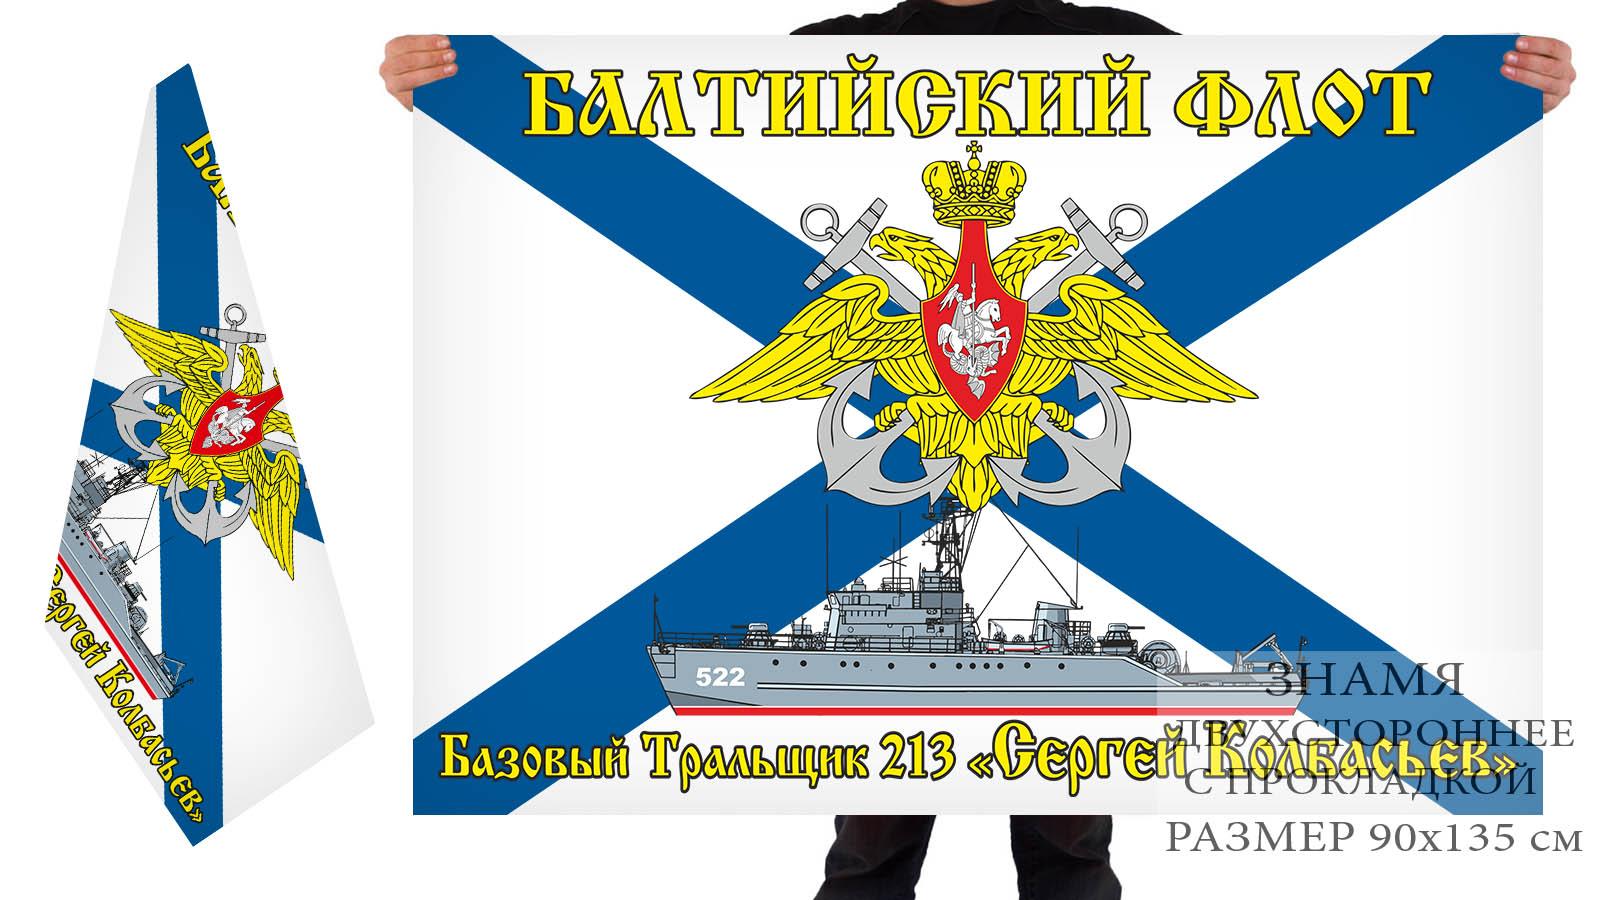 "Двусторонний флаг БТ-213 ""Сергей Колбасьев"""